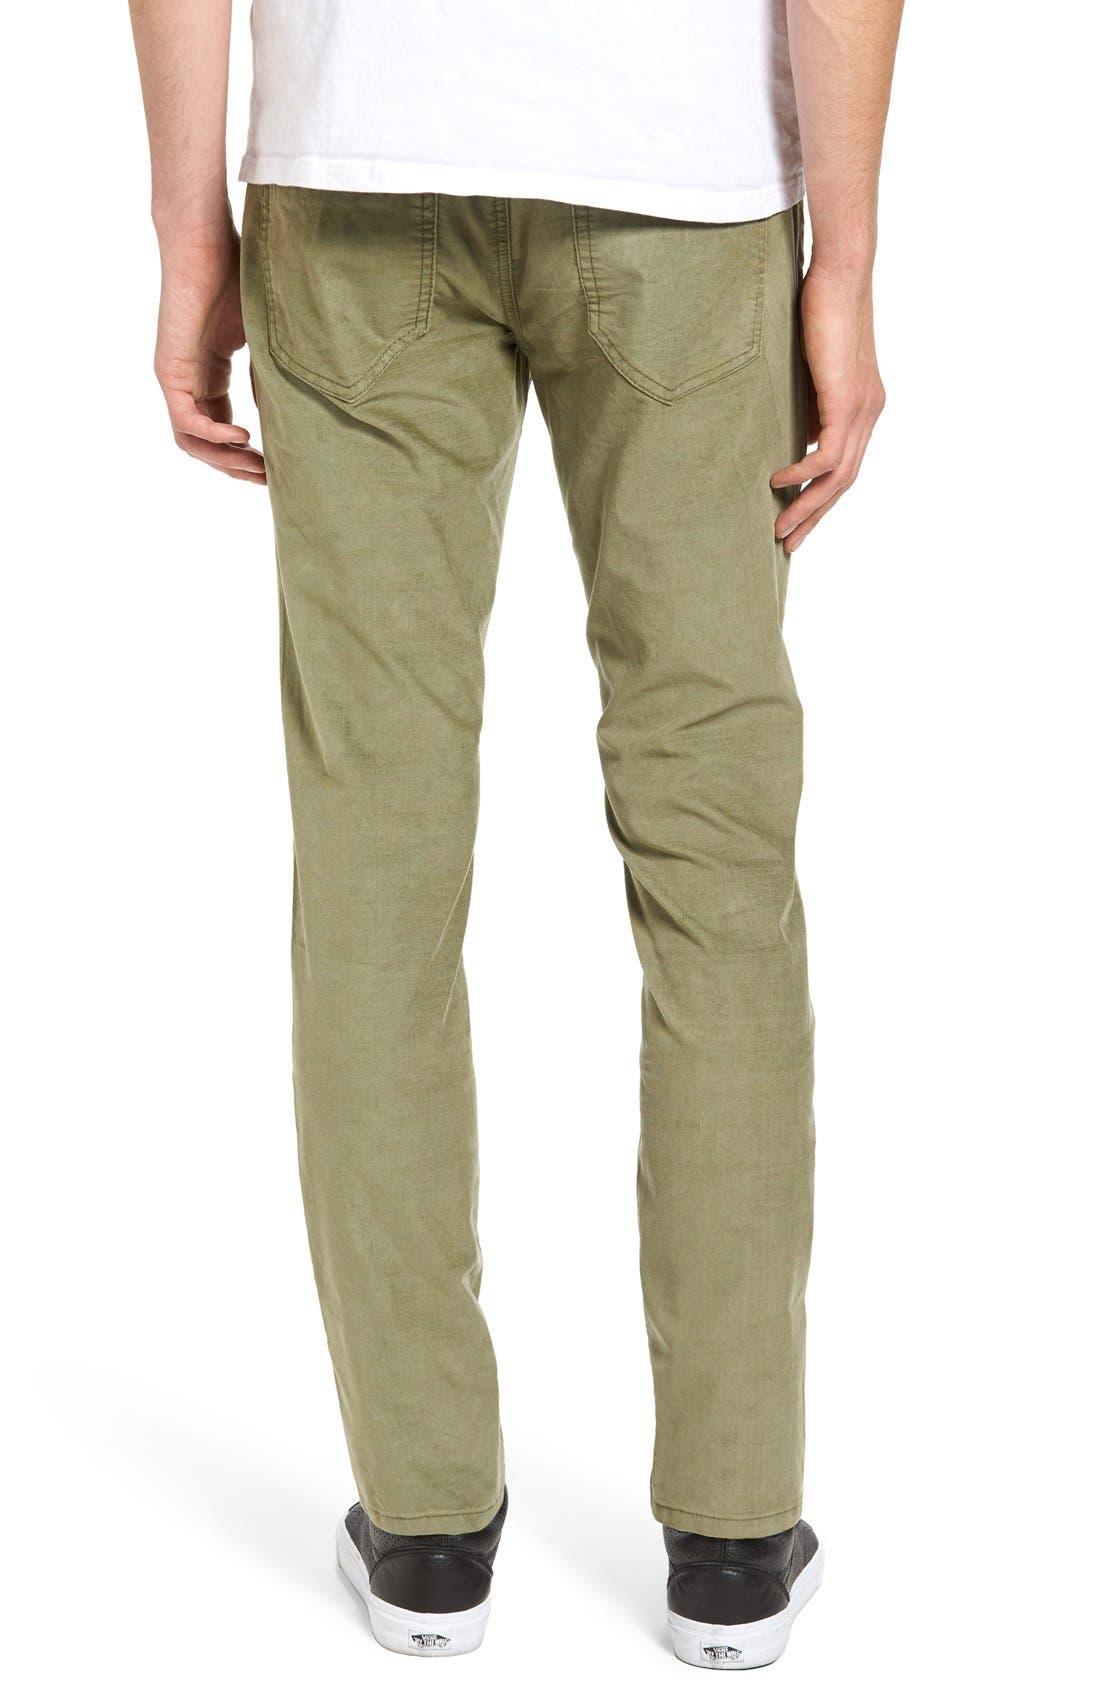 Bryce Chopper Slim Fit Corduroy Pants,                             Alternate thumbnail 2, color,                             Olive